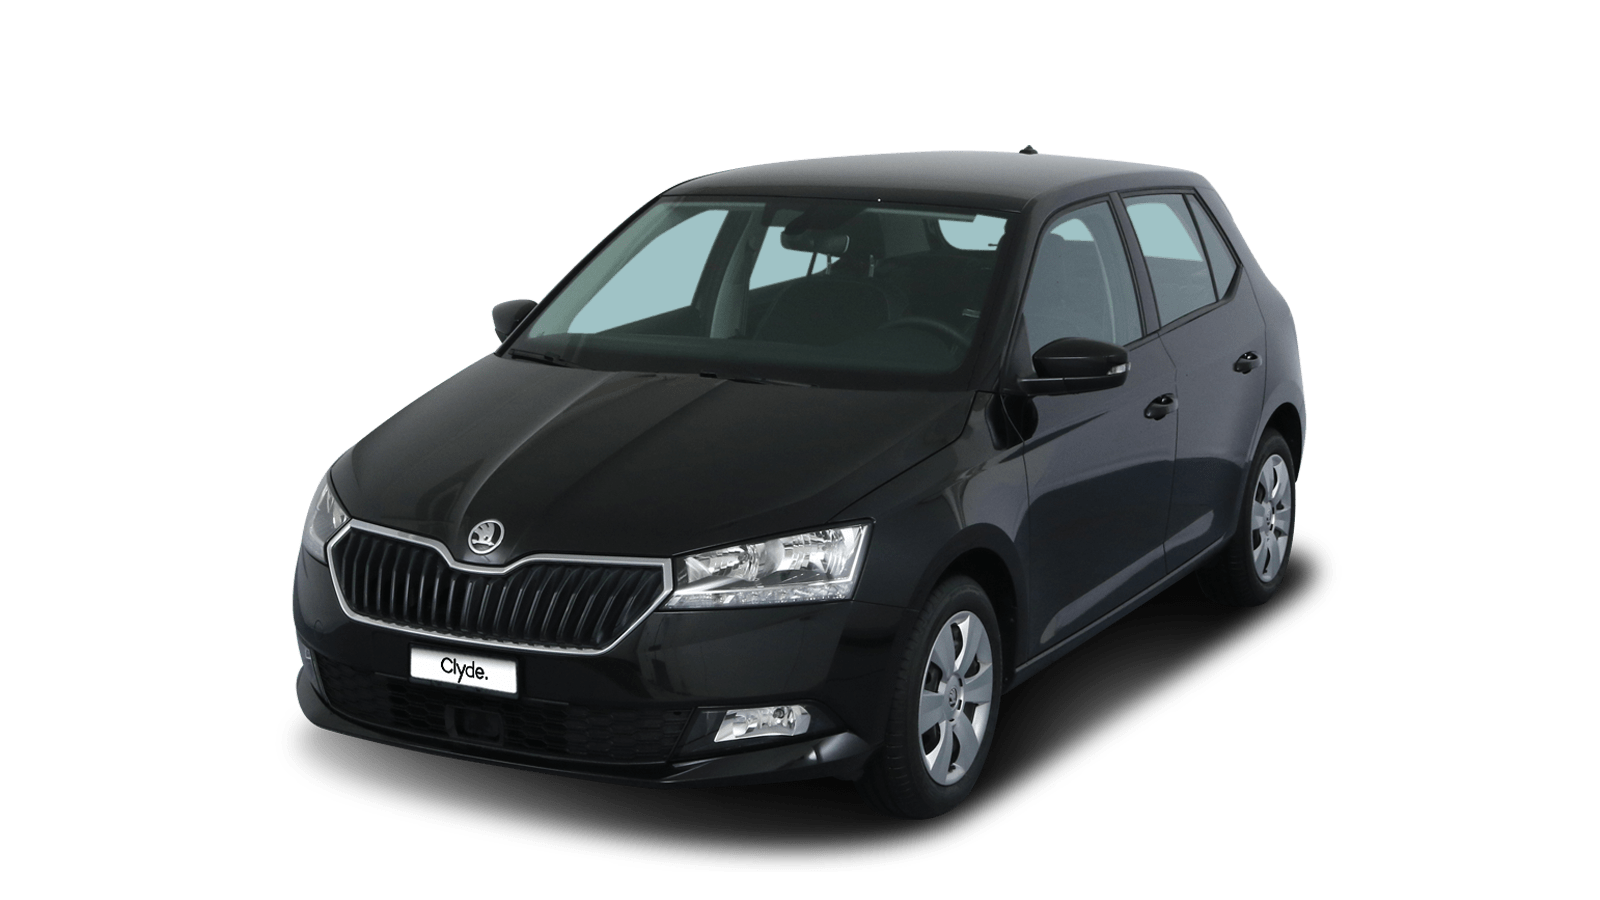 ŠKODA Fabia Black front - Clyde car subscription